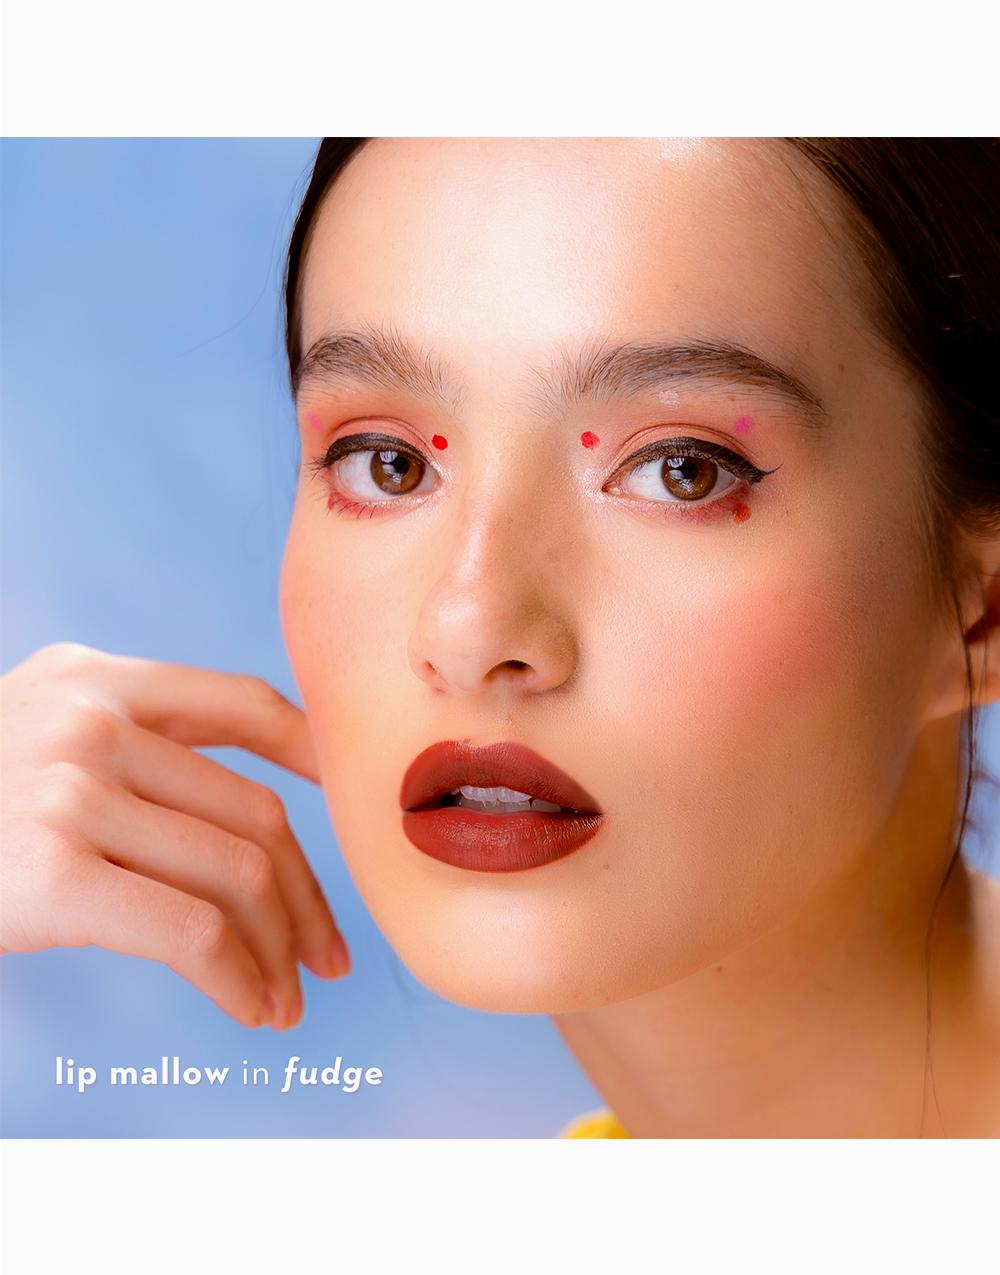 Lip Mallow Mousse by Happy Skin | Fudge